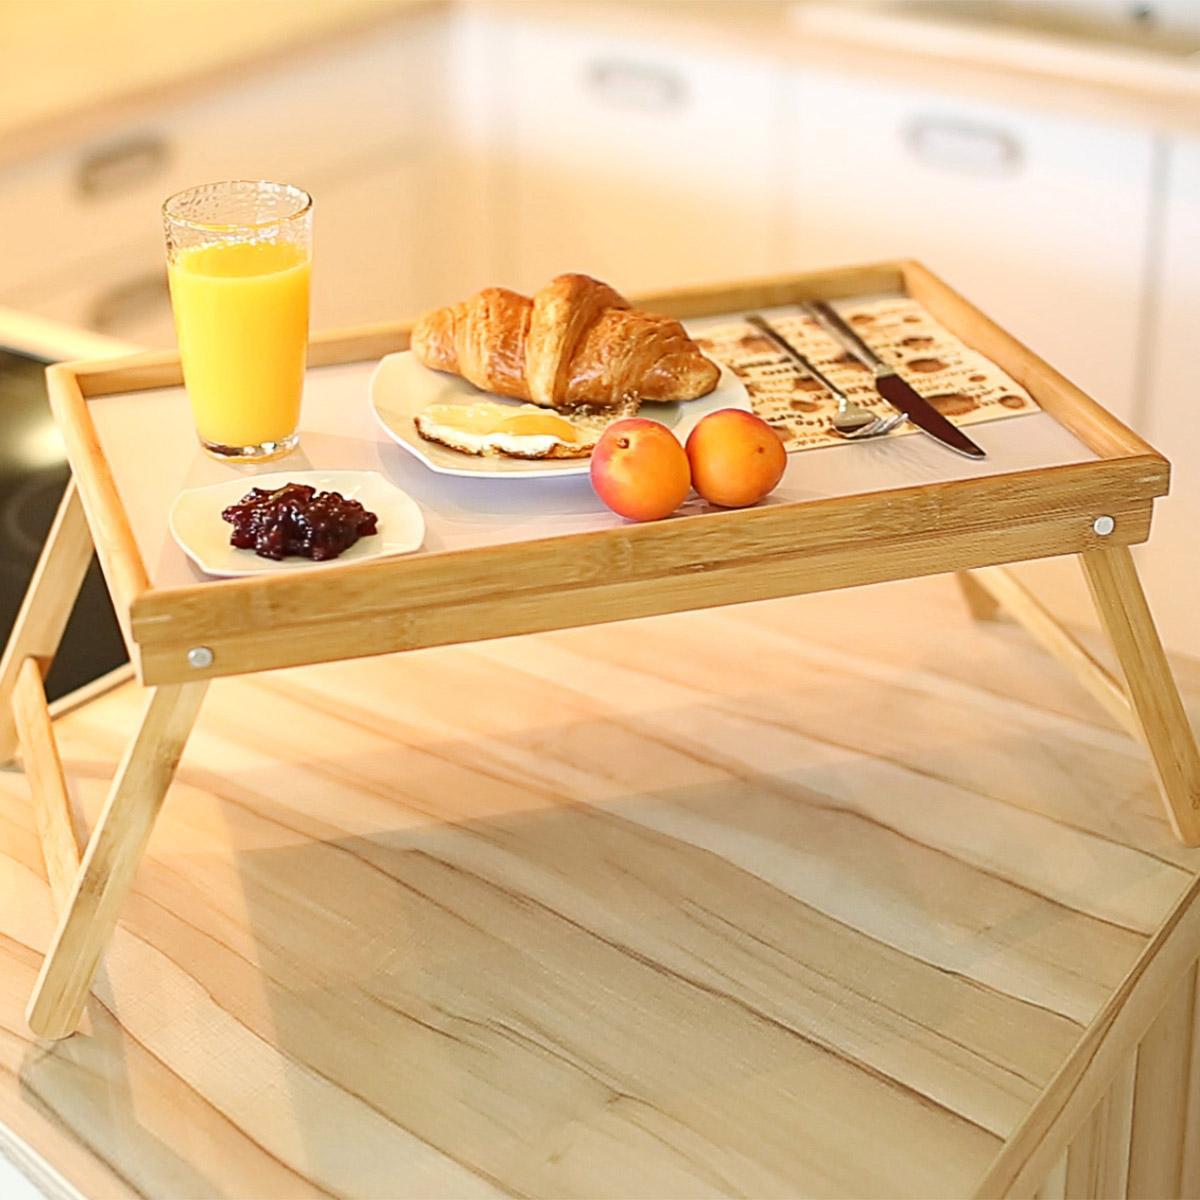 Stolík pre notebook, raňajkové stolíky - Obrázok č. 17